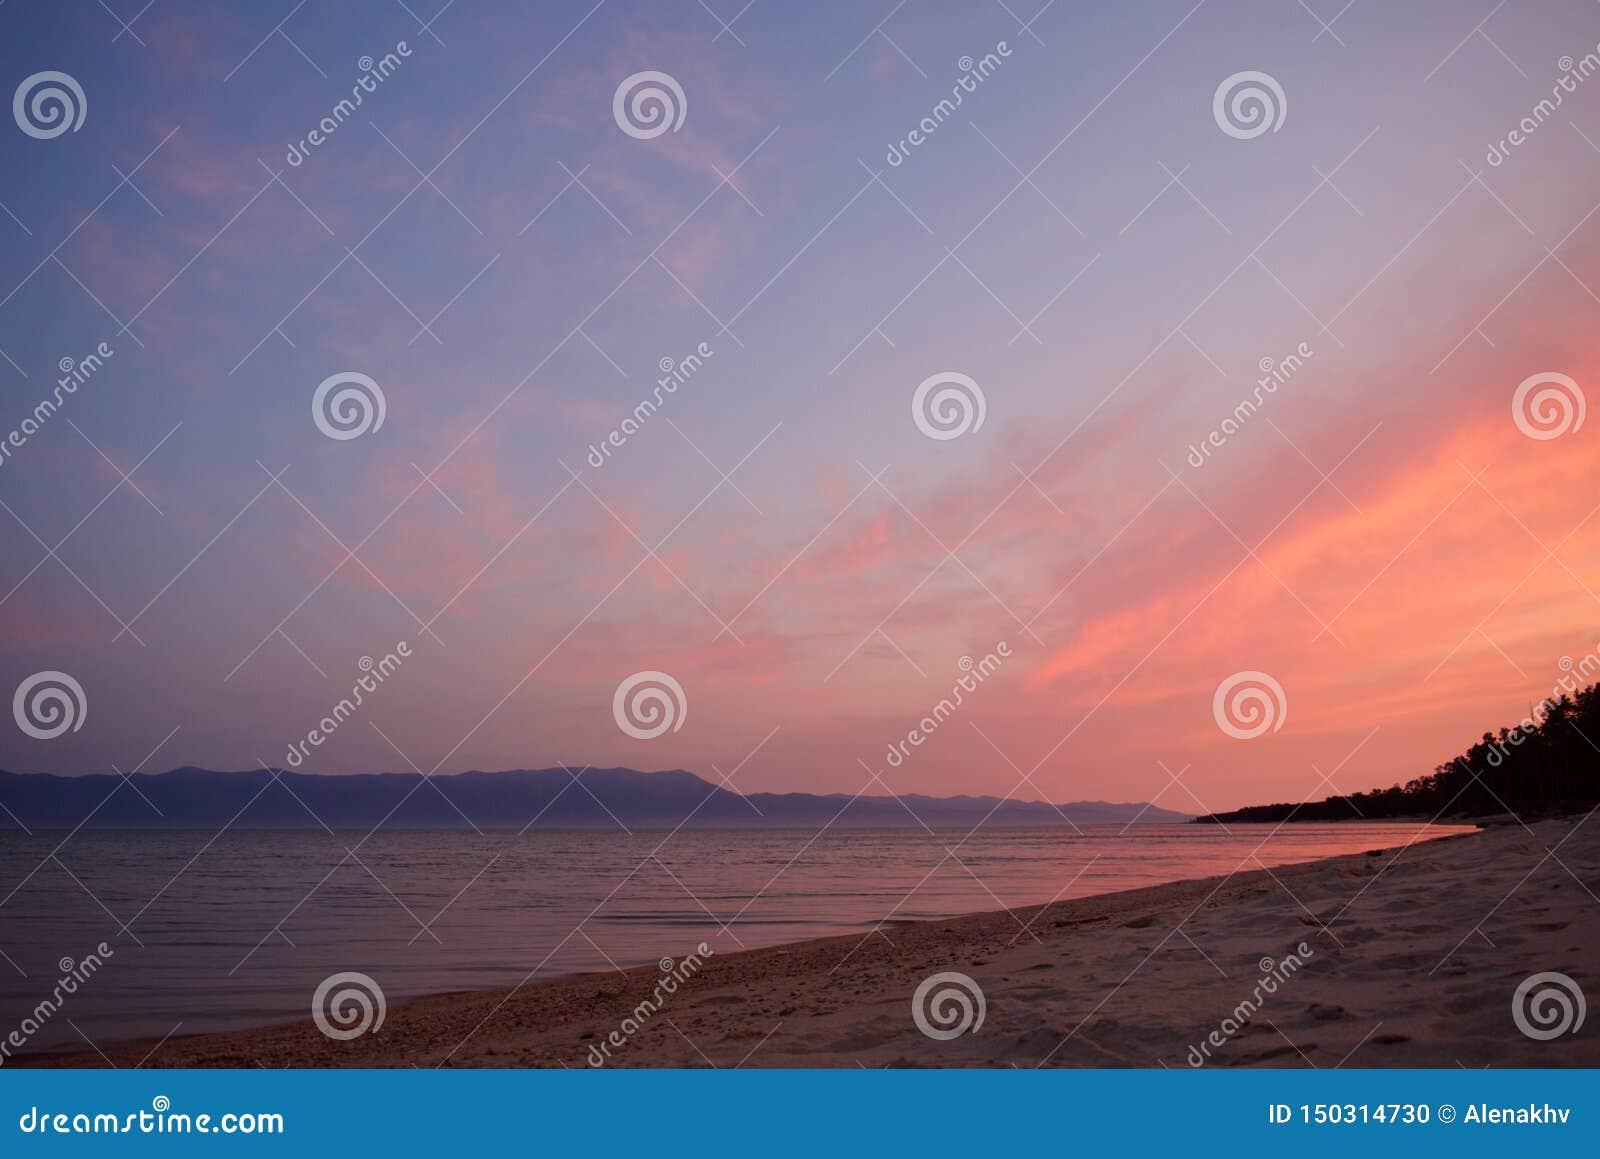 Salida del sol púrpura y rosada sobre el lago Baikal